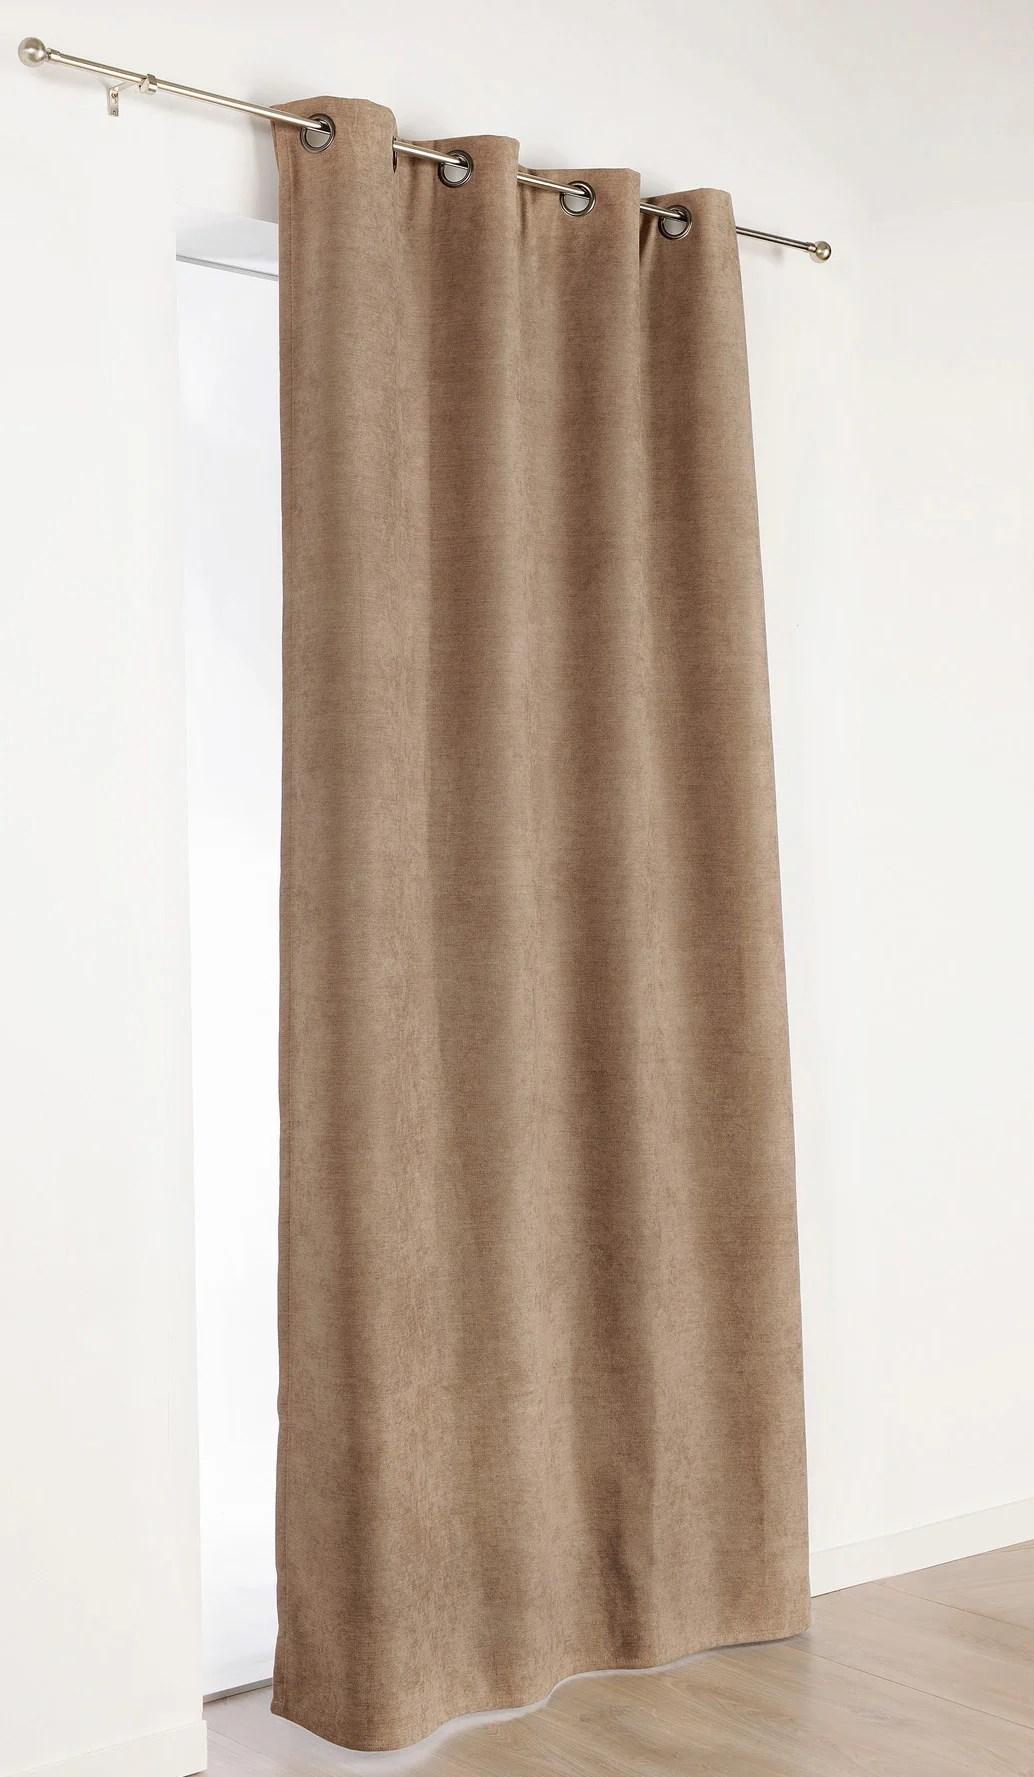 rideau occultant thermique alaska chocolat l 140 x h 260 cm